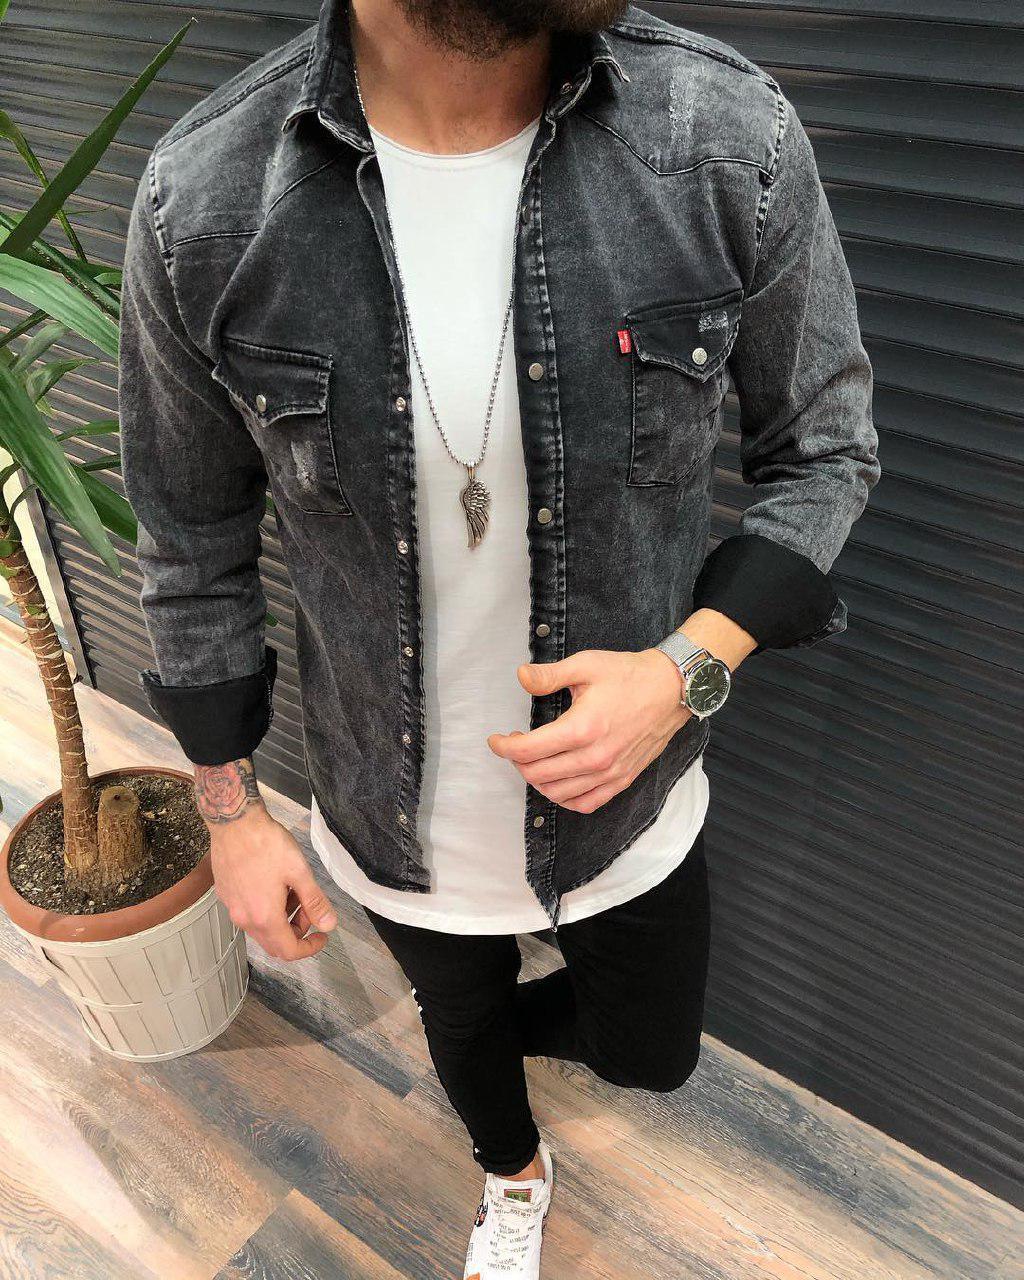 e47e28370ac Мужская темно-серая джинсовая рубашка  продажа